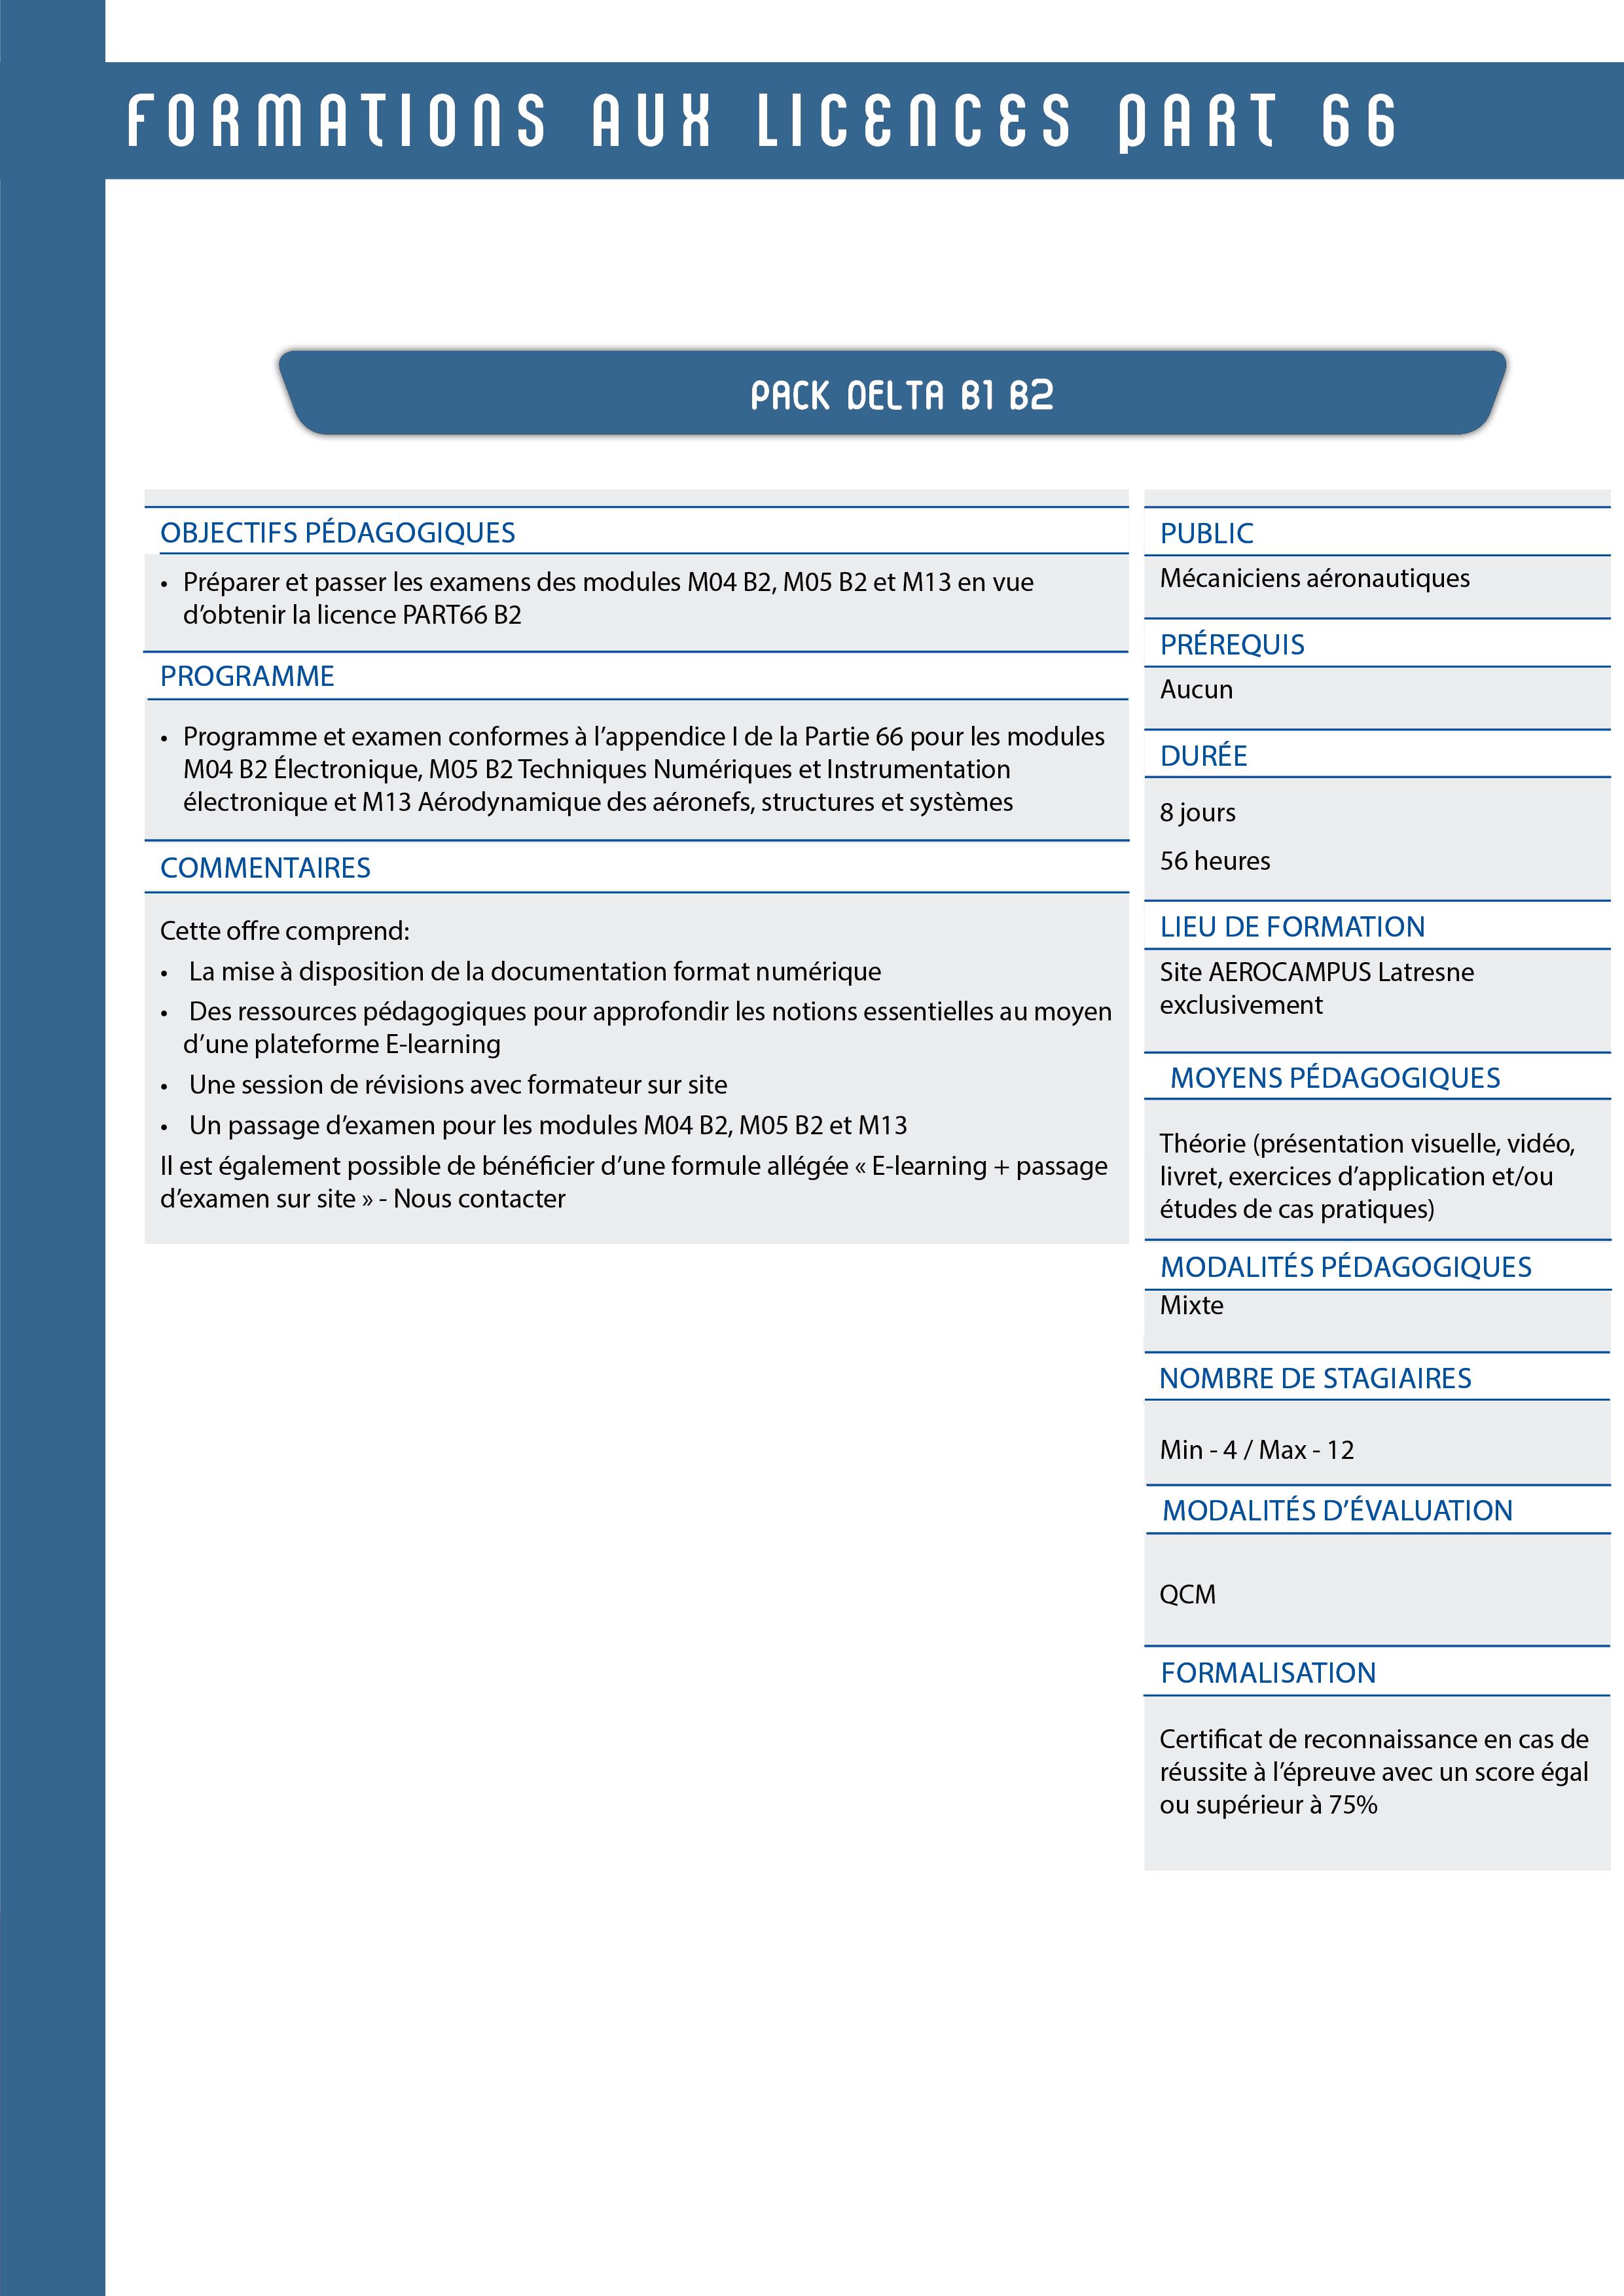 CATALOGUE FORMATIONS CONTINUES AEROCAMPUS_Ed2020_HD54